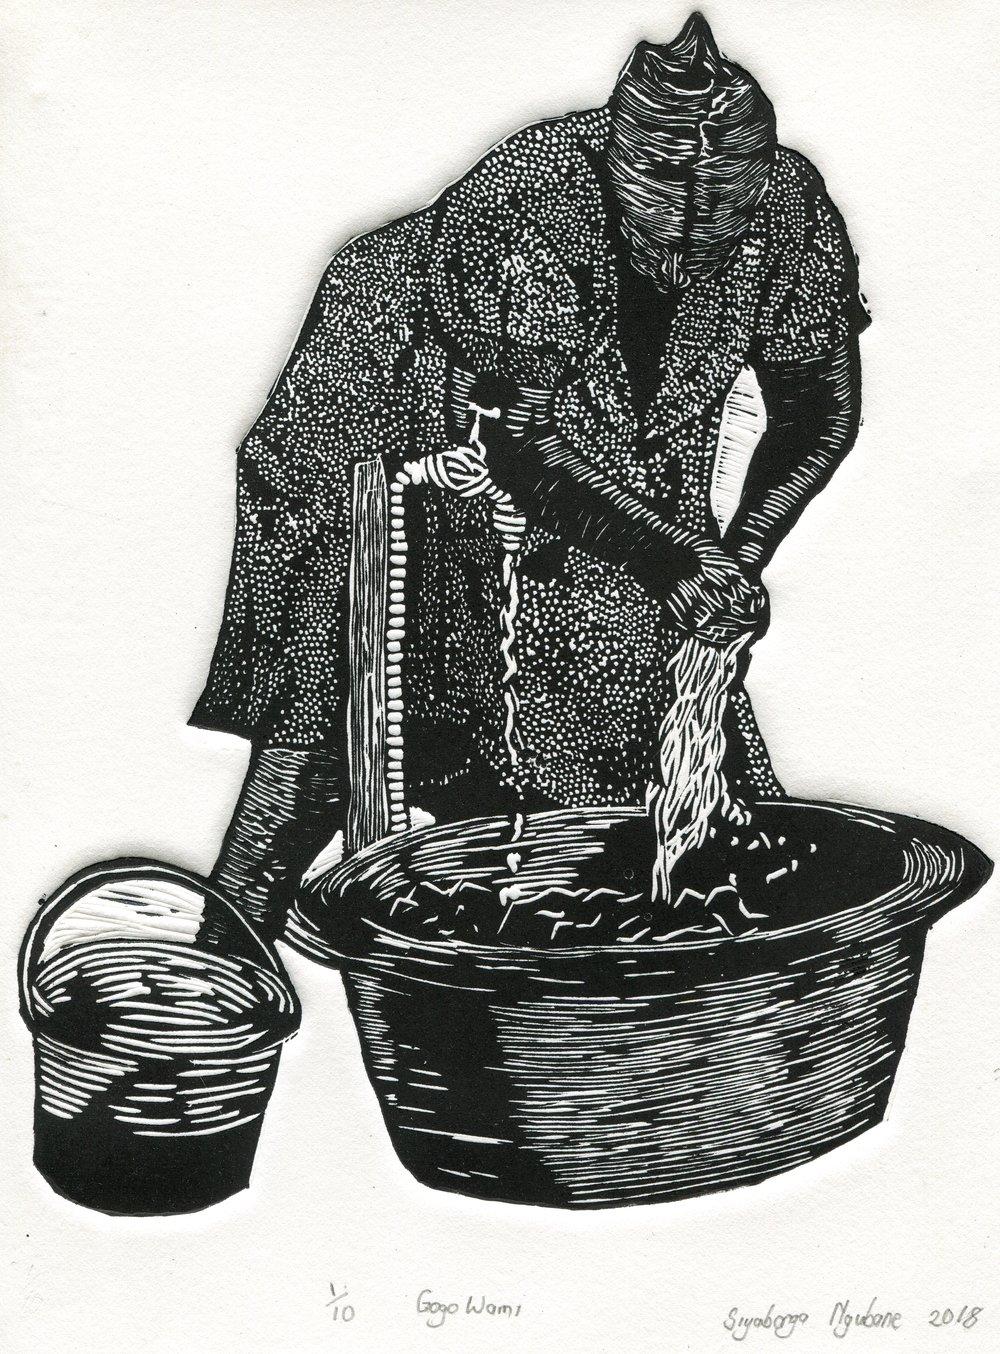 48b  Siyabonga Ngubane  Gogo wami  linocut print on paper